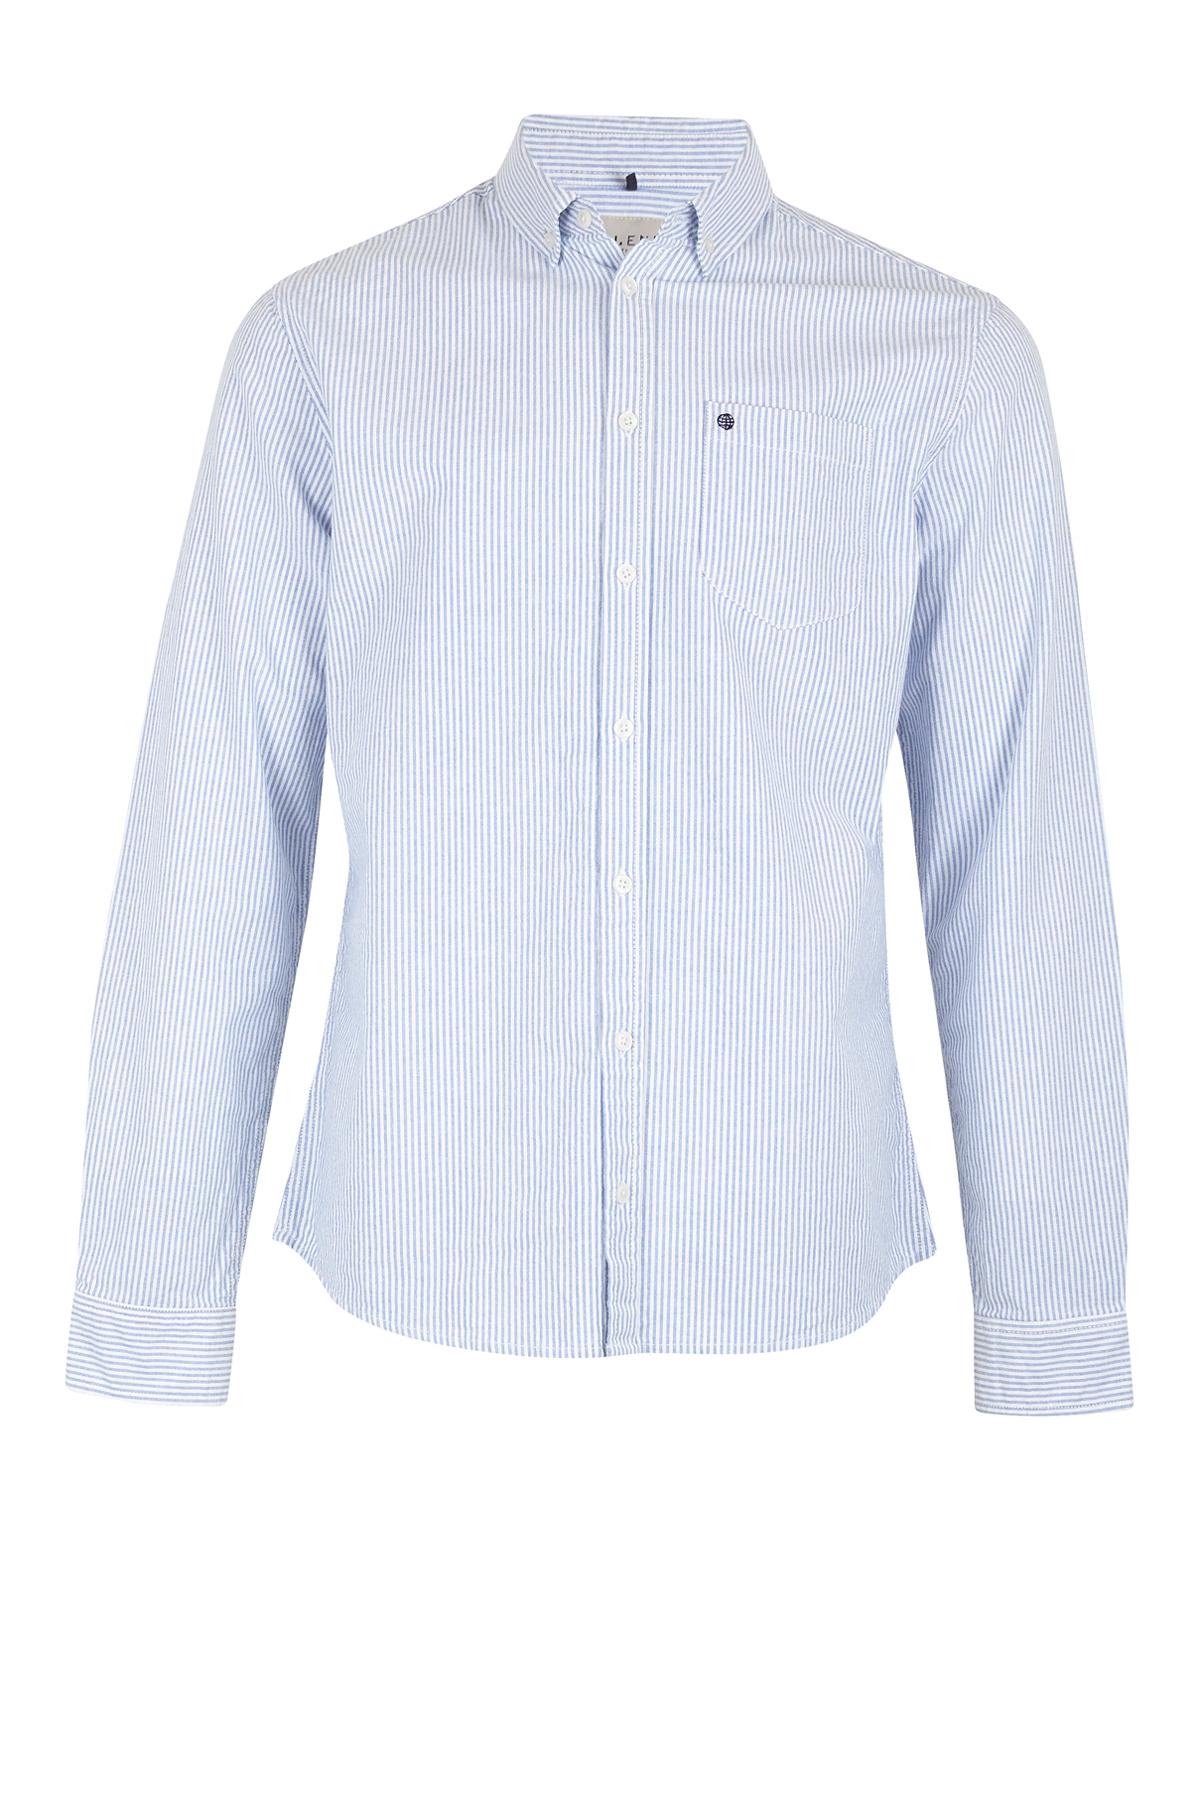 Regatta Langærmet skjorte – Køb Regatta Langærmet skjorte fra str. S-XXXL her